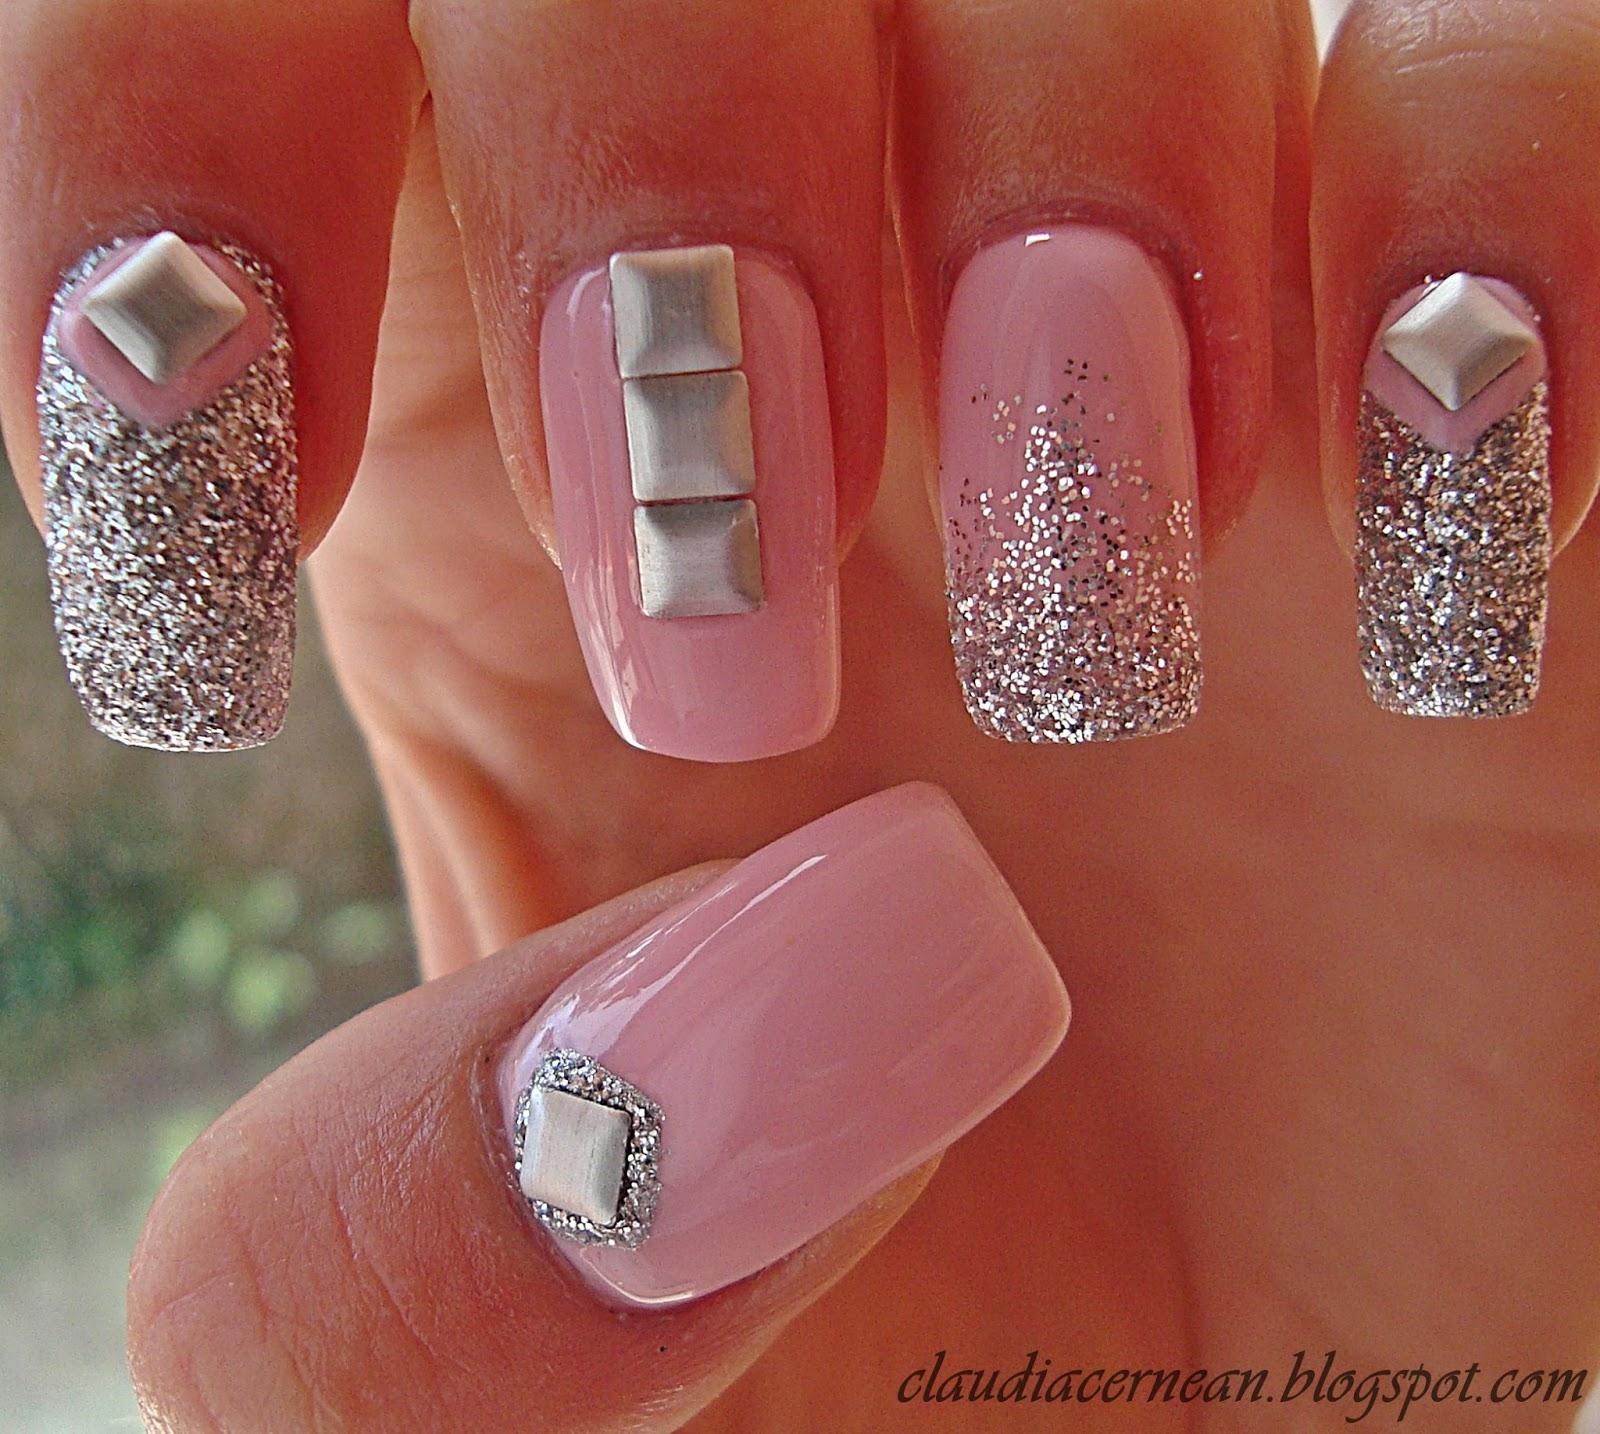 Kkcenterhk Blog Unghii Cu Tinte Studs Nails By Claudiacernean